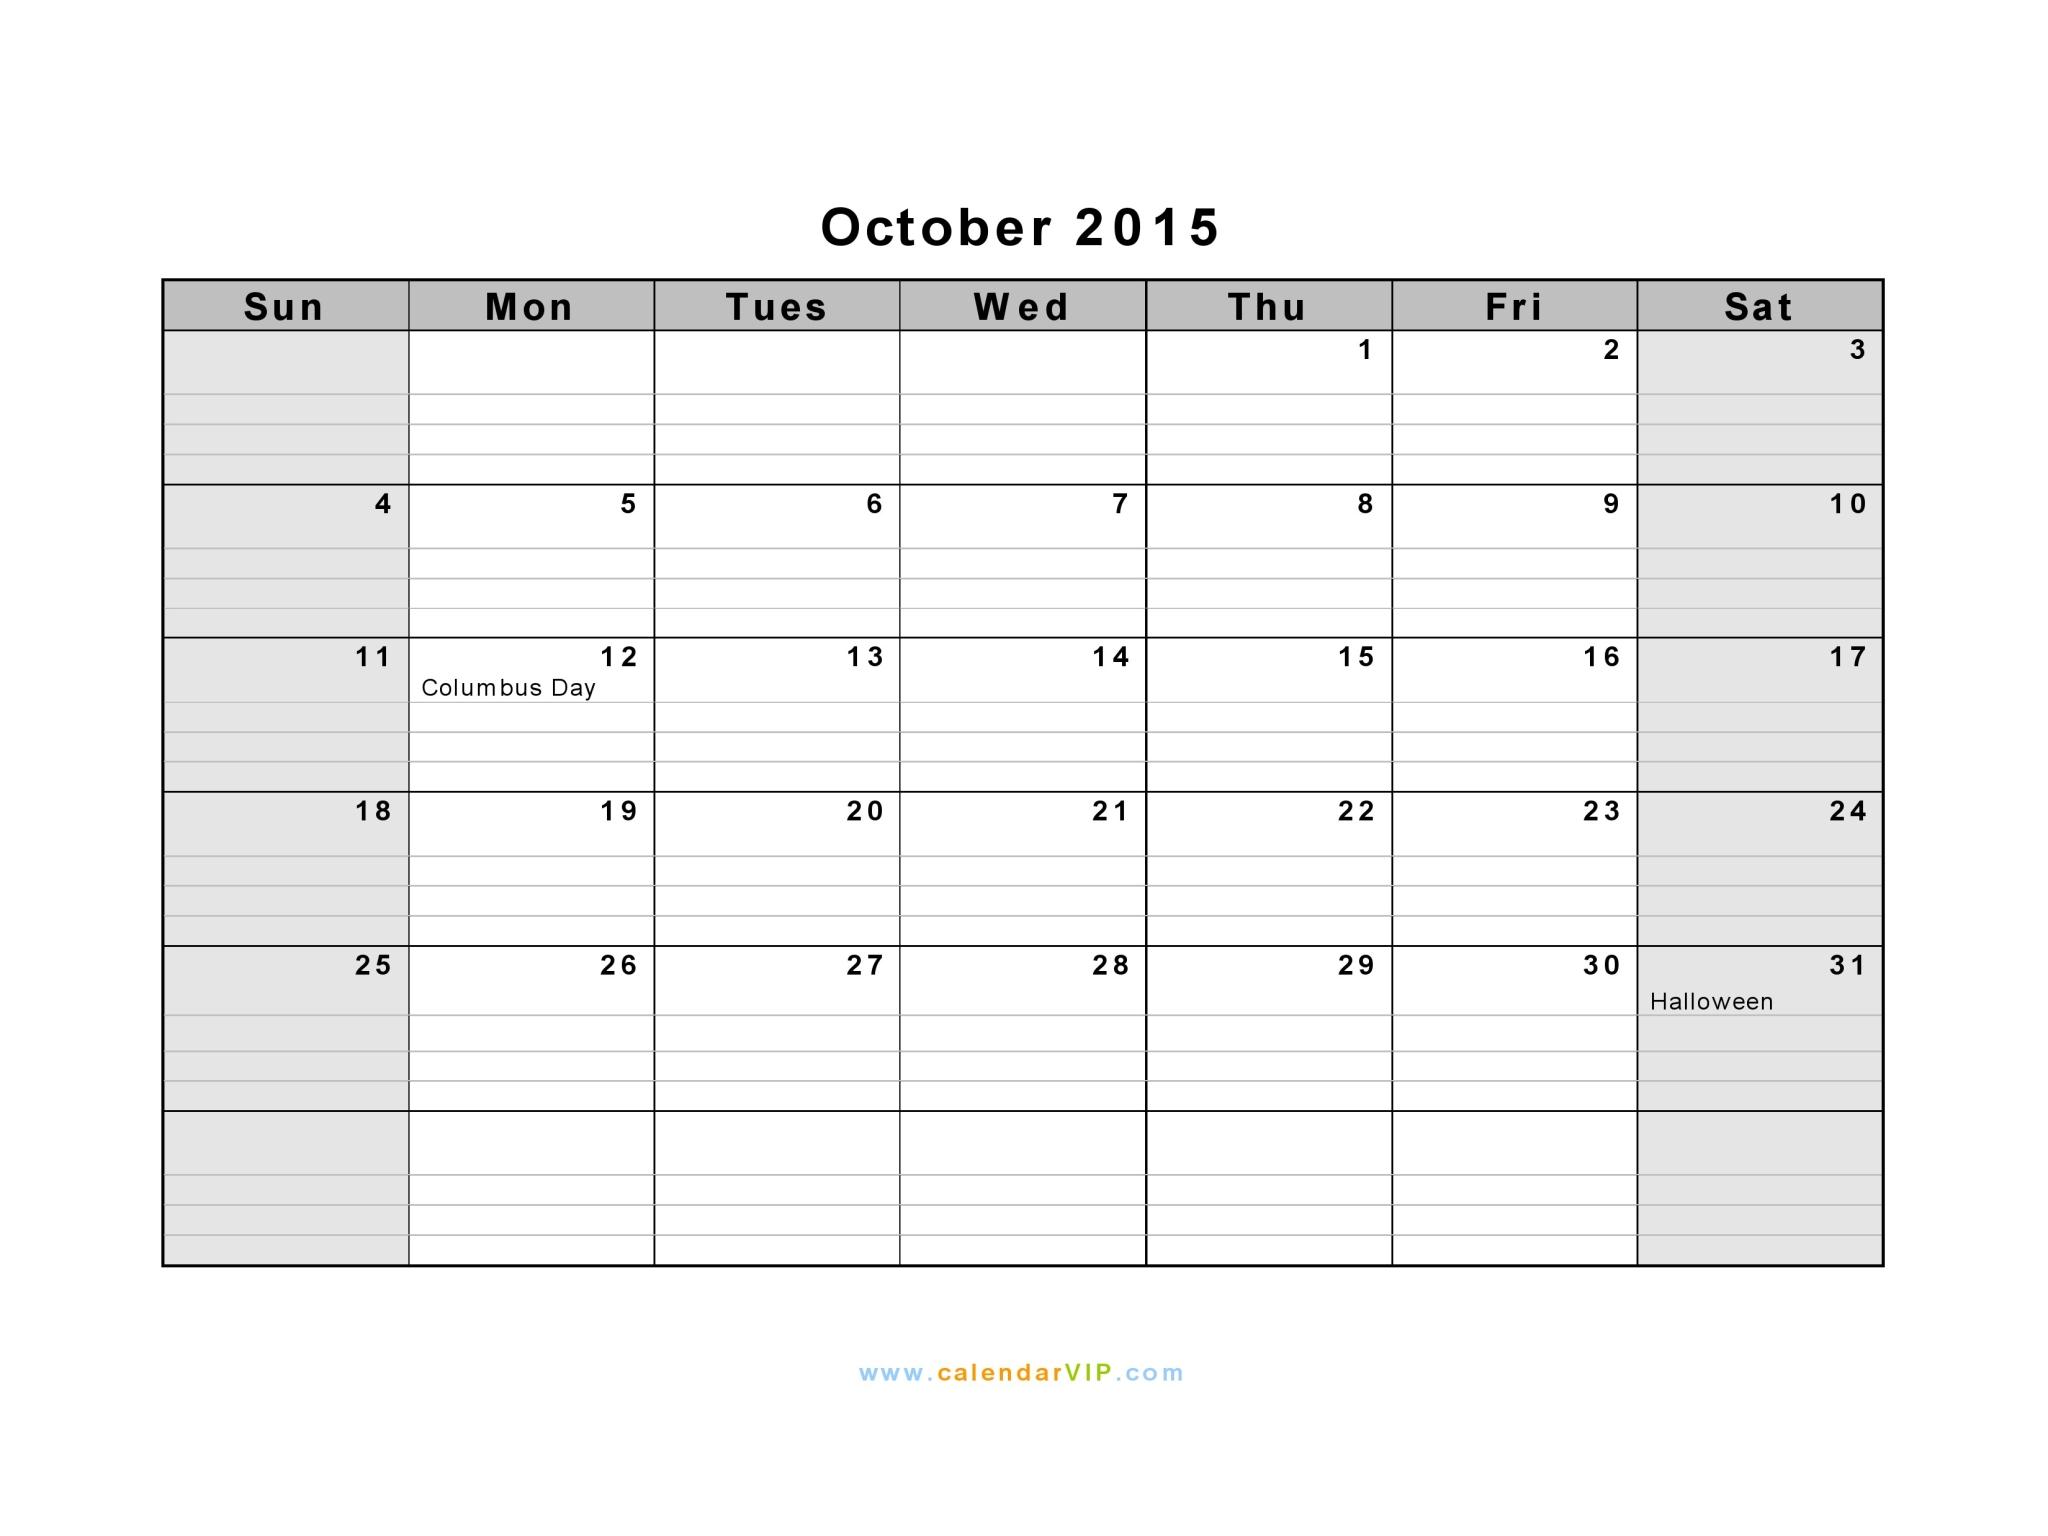 october 2015 calendar october 2015 calendar october 2015 calendar calendar template